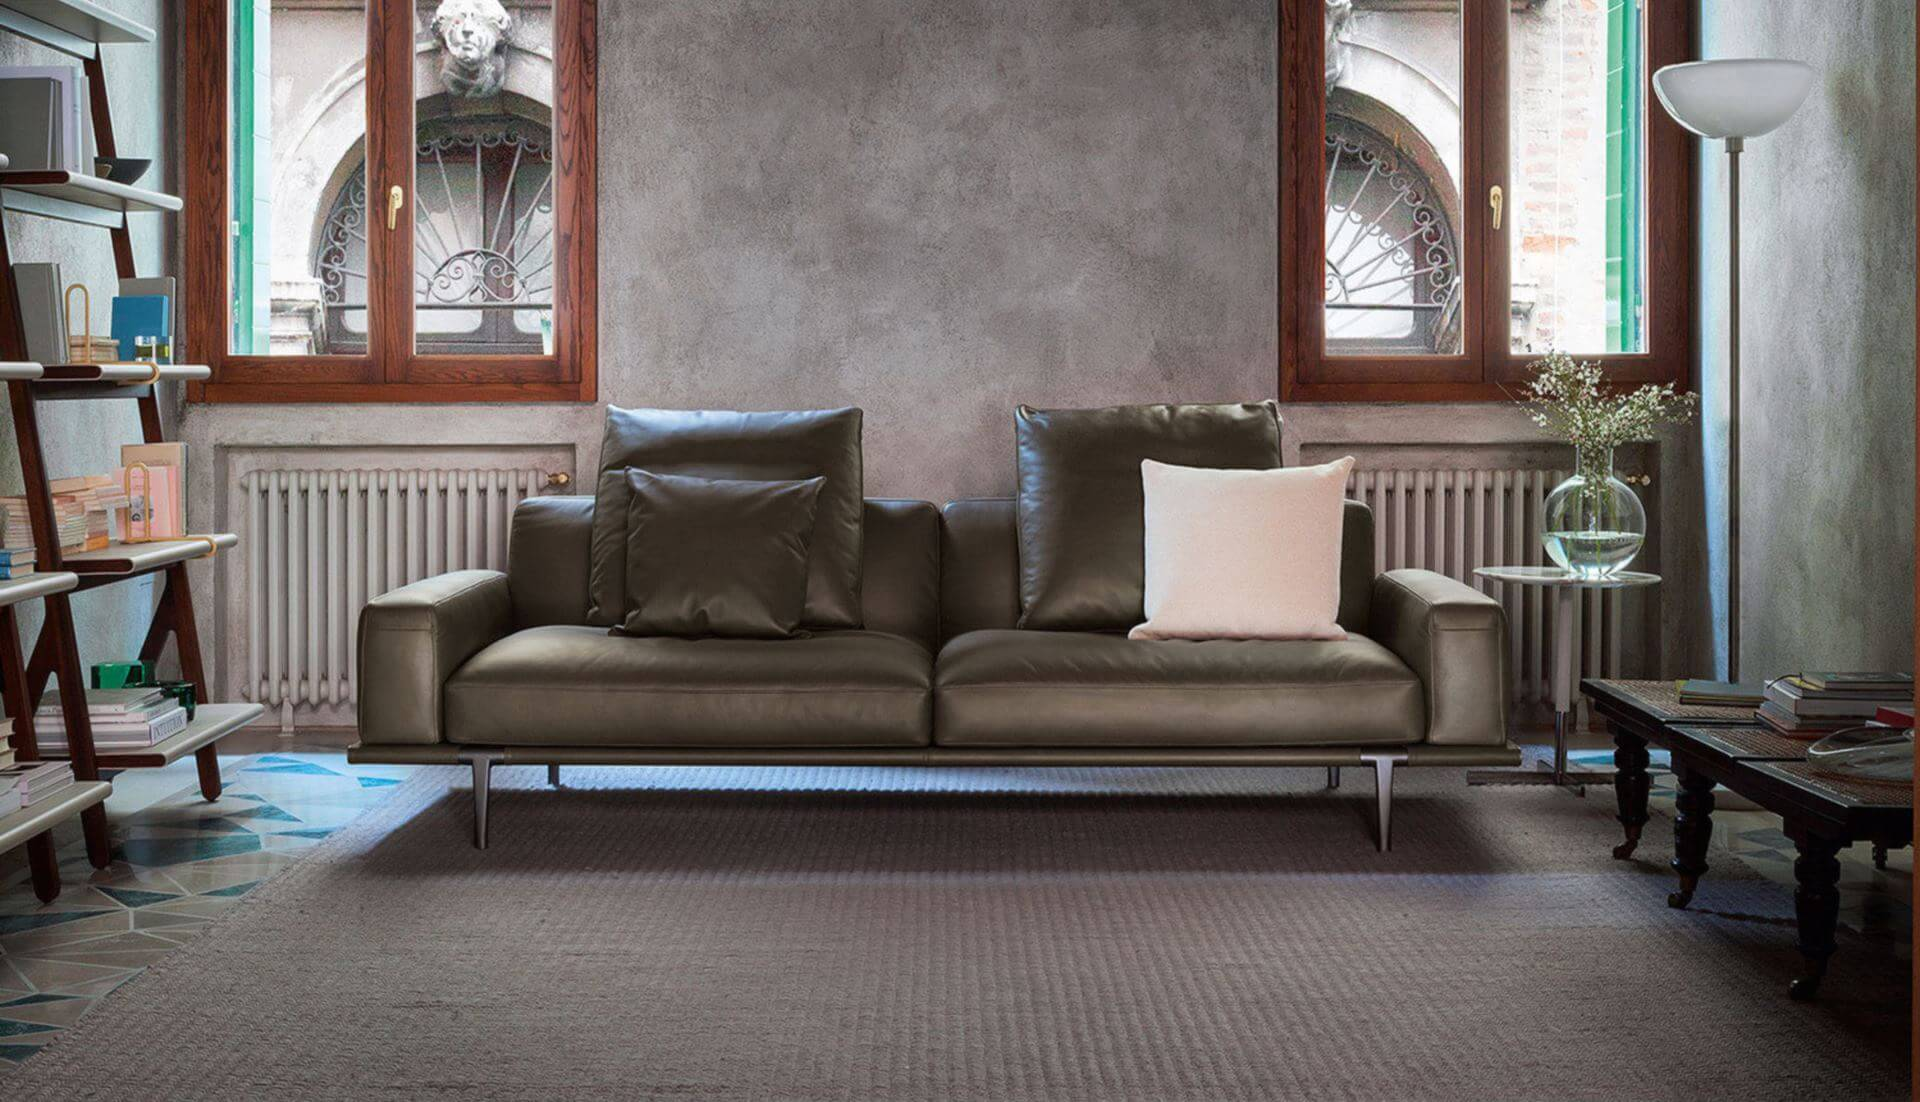 Poltrona Frau Let It Be Modular Sofa - Dream Design ...